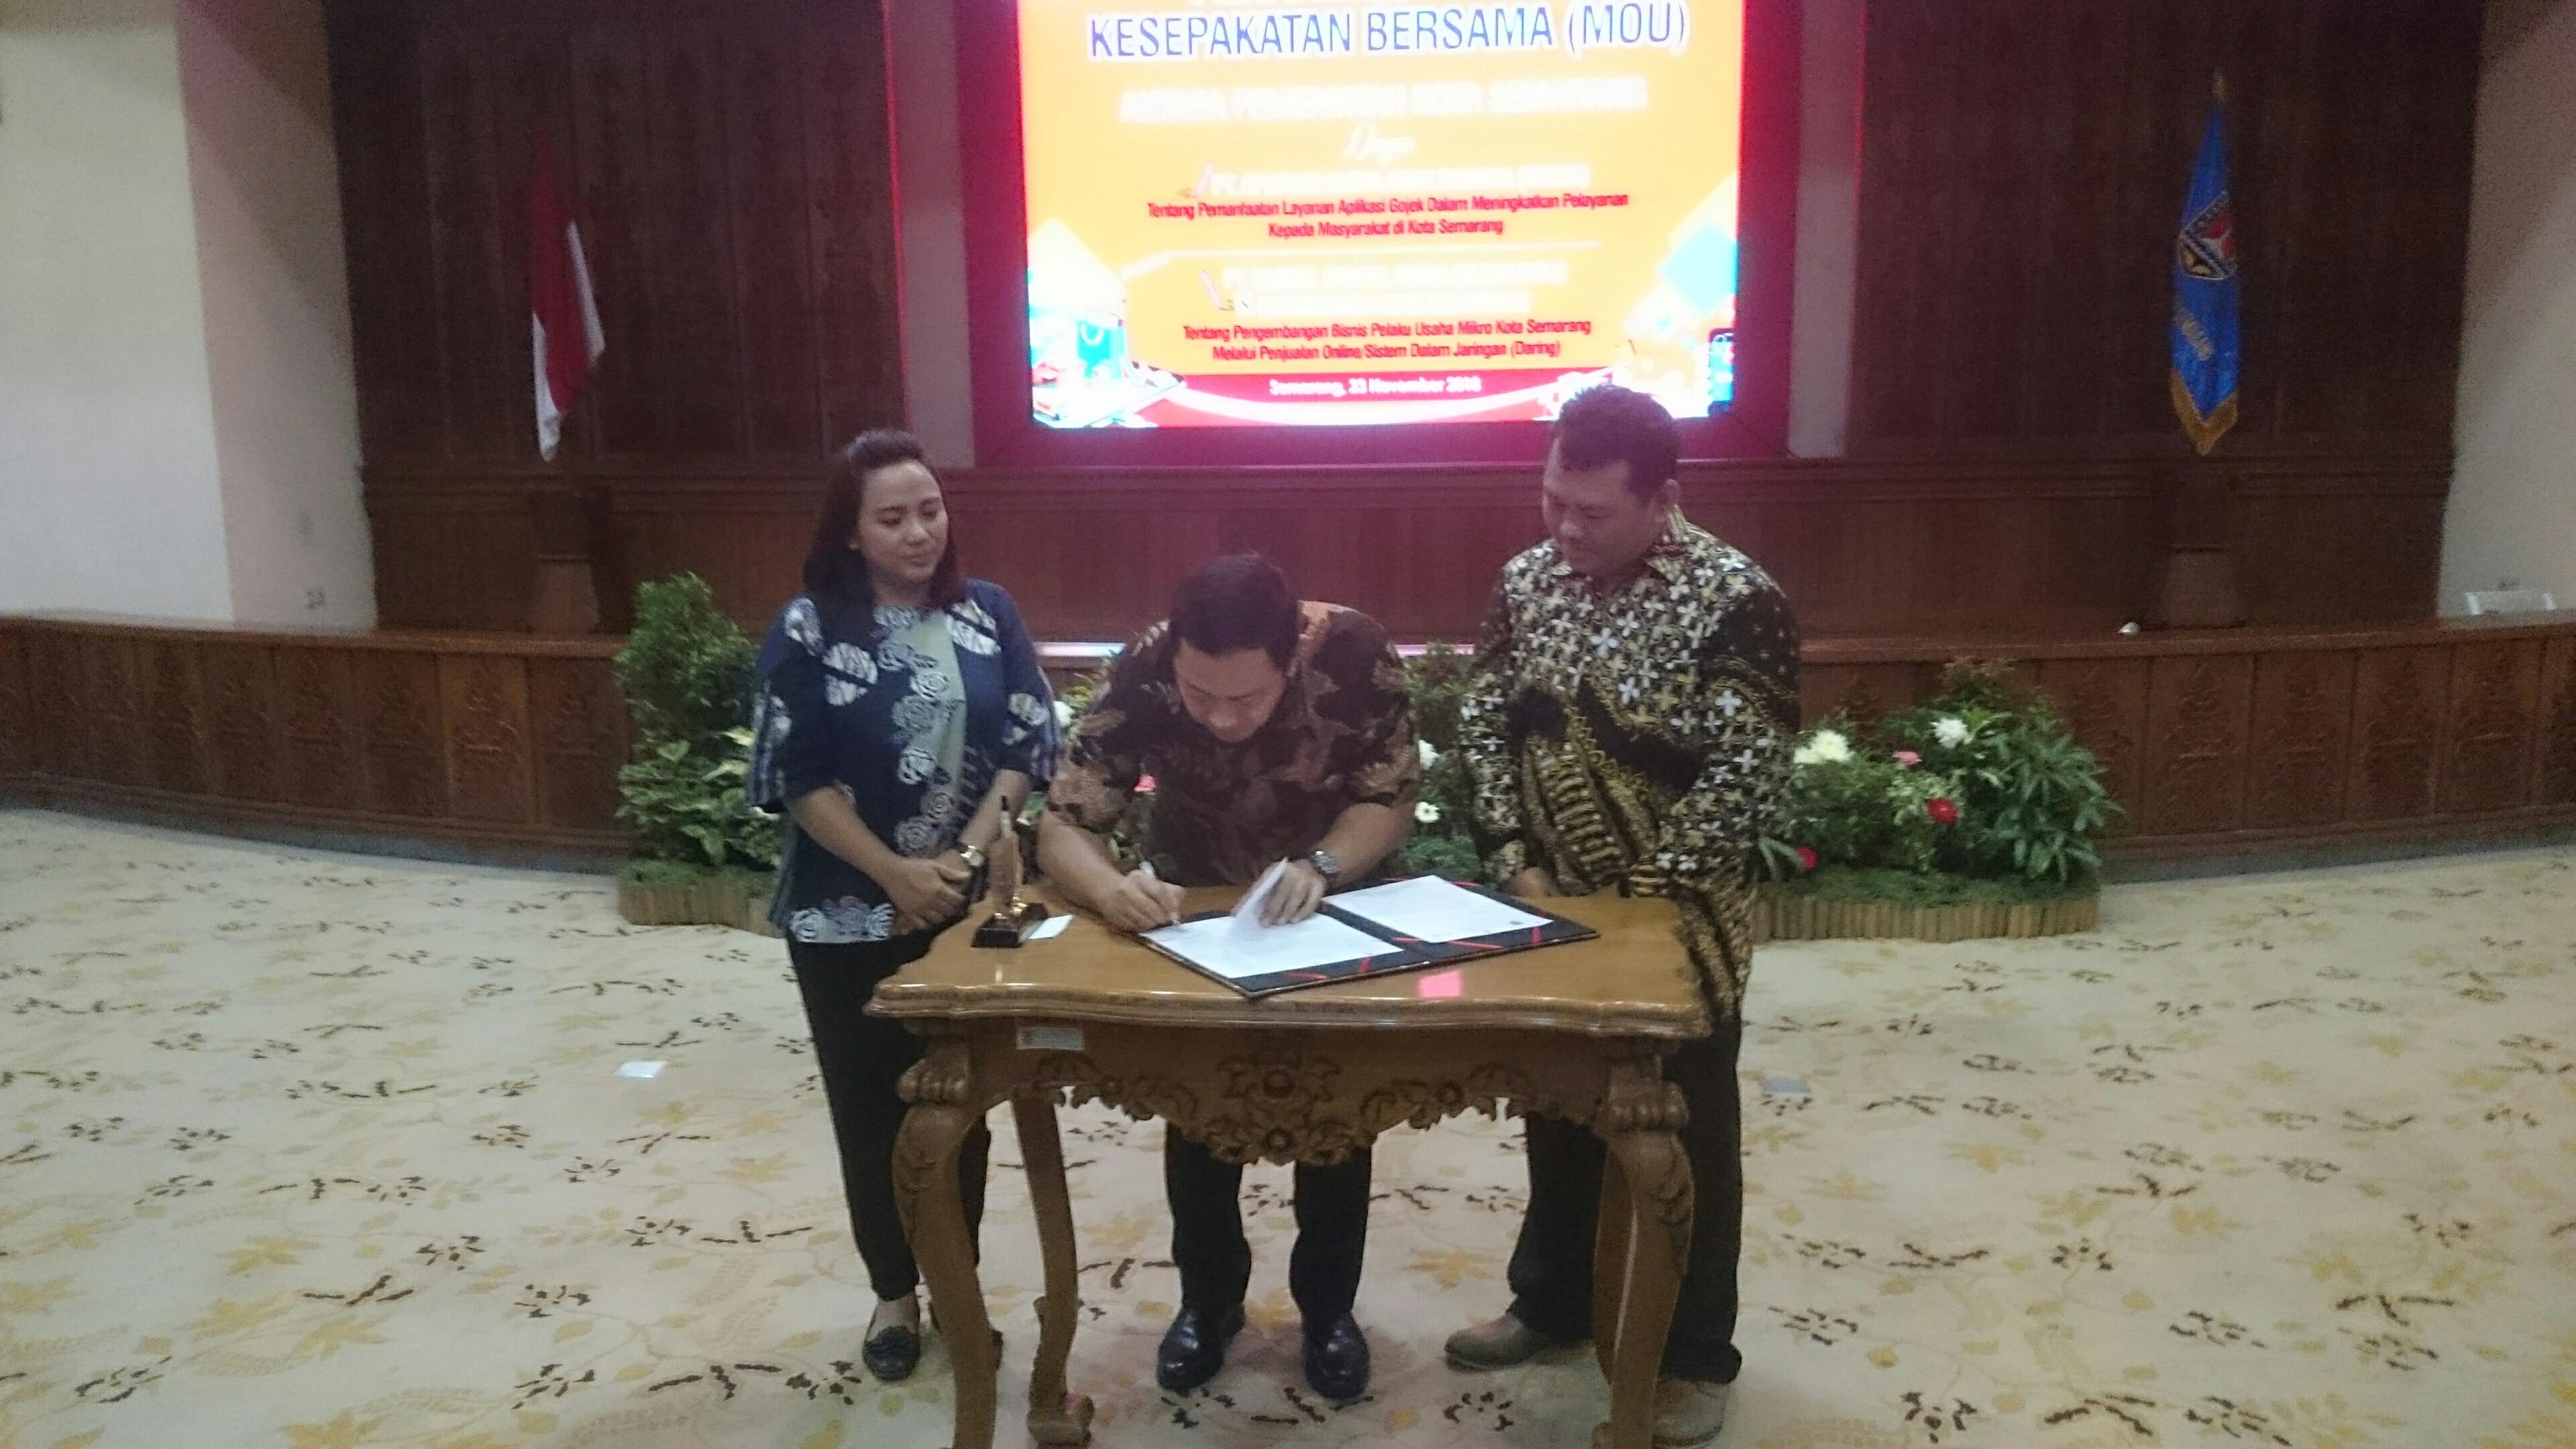 Pemkot Semarang Gandeng Gojek dan Blibli.com Pacu UMKM ...